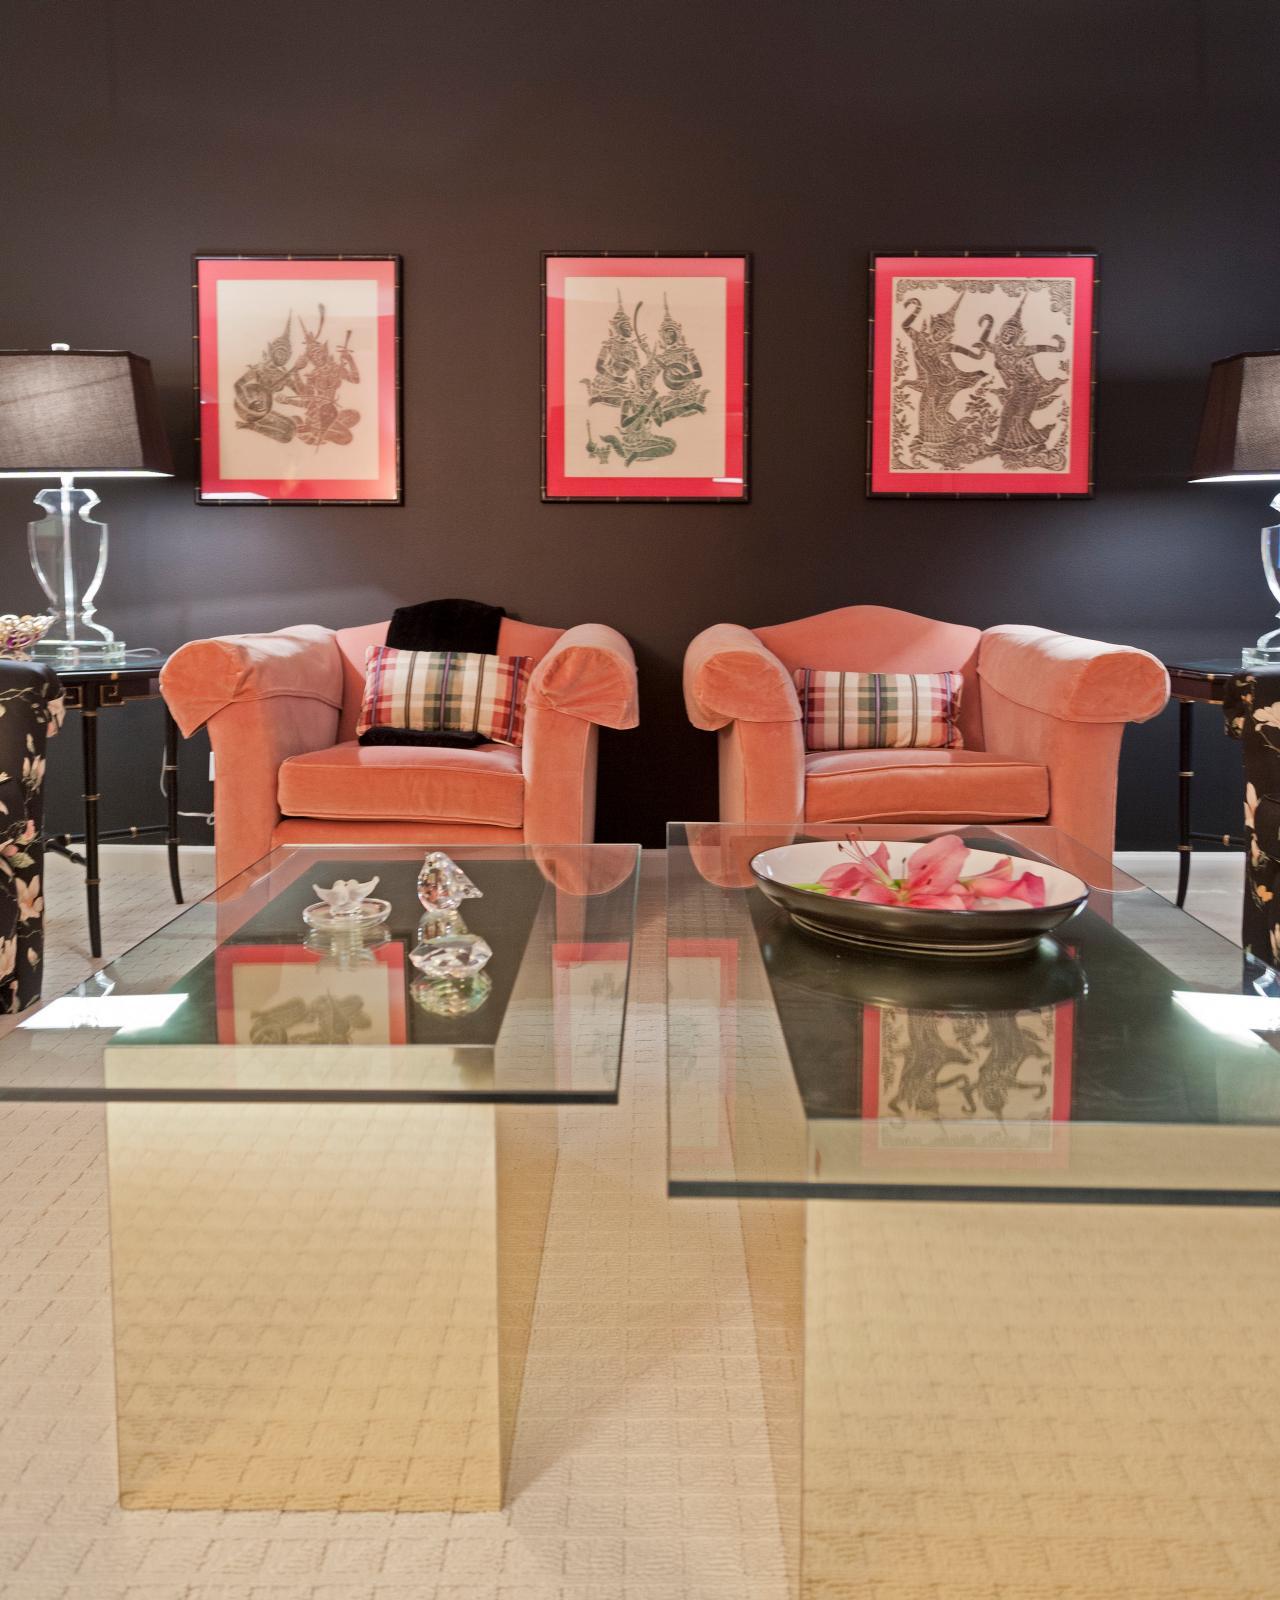 Diy Network Peach Living Room Walls